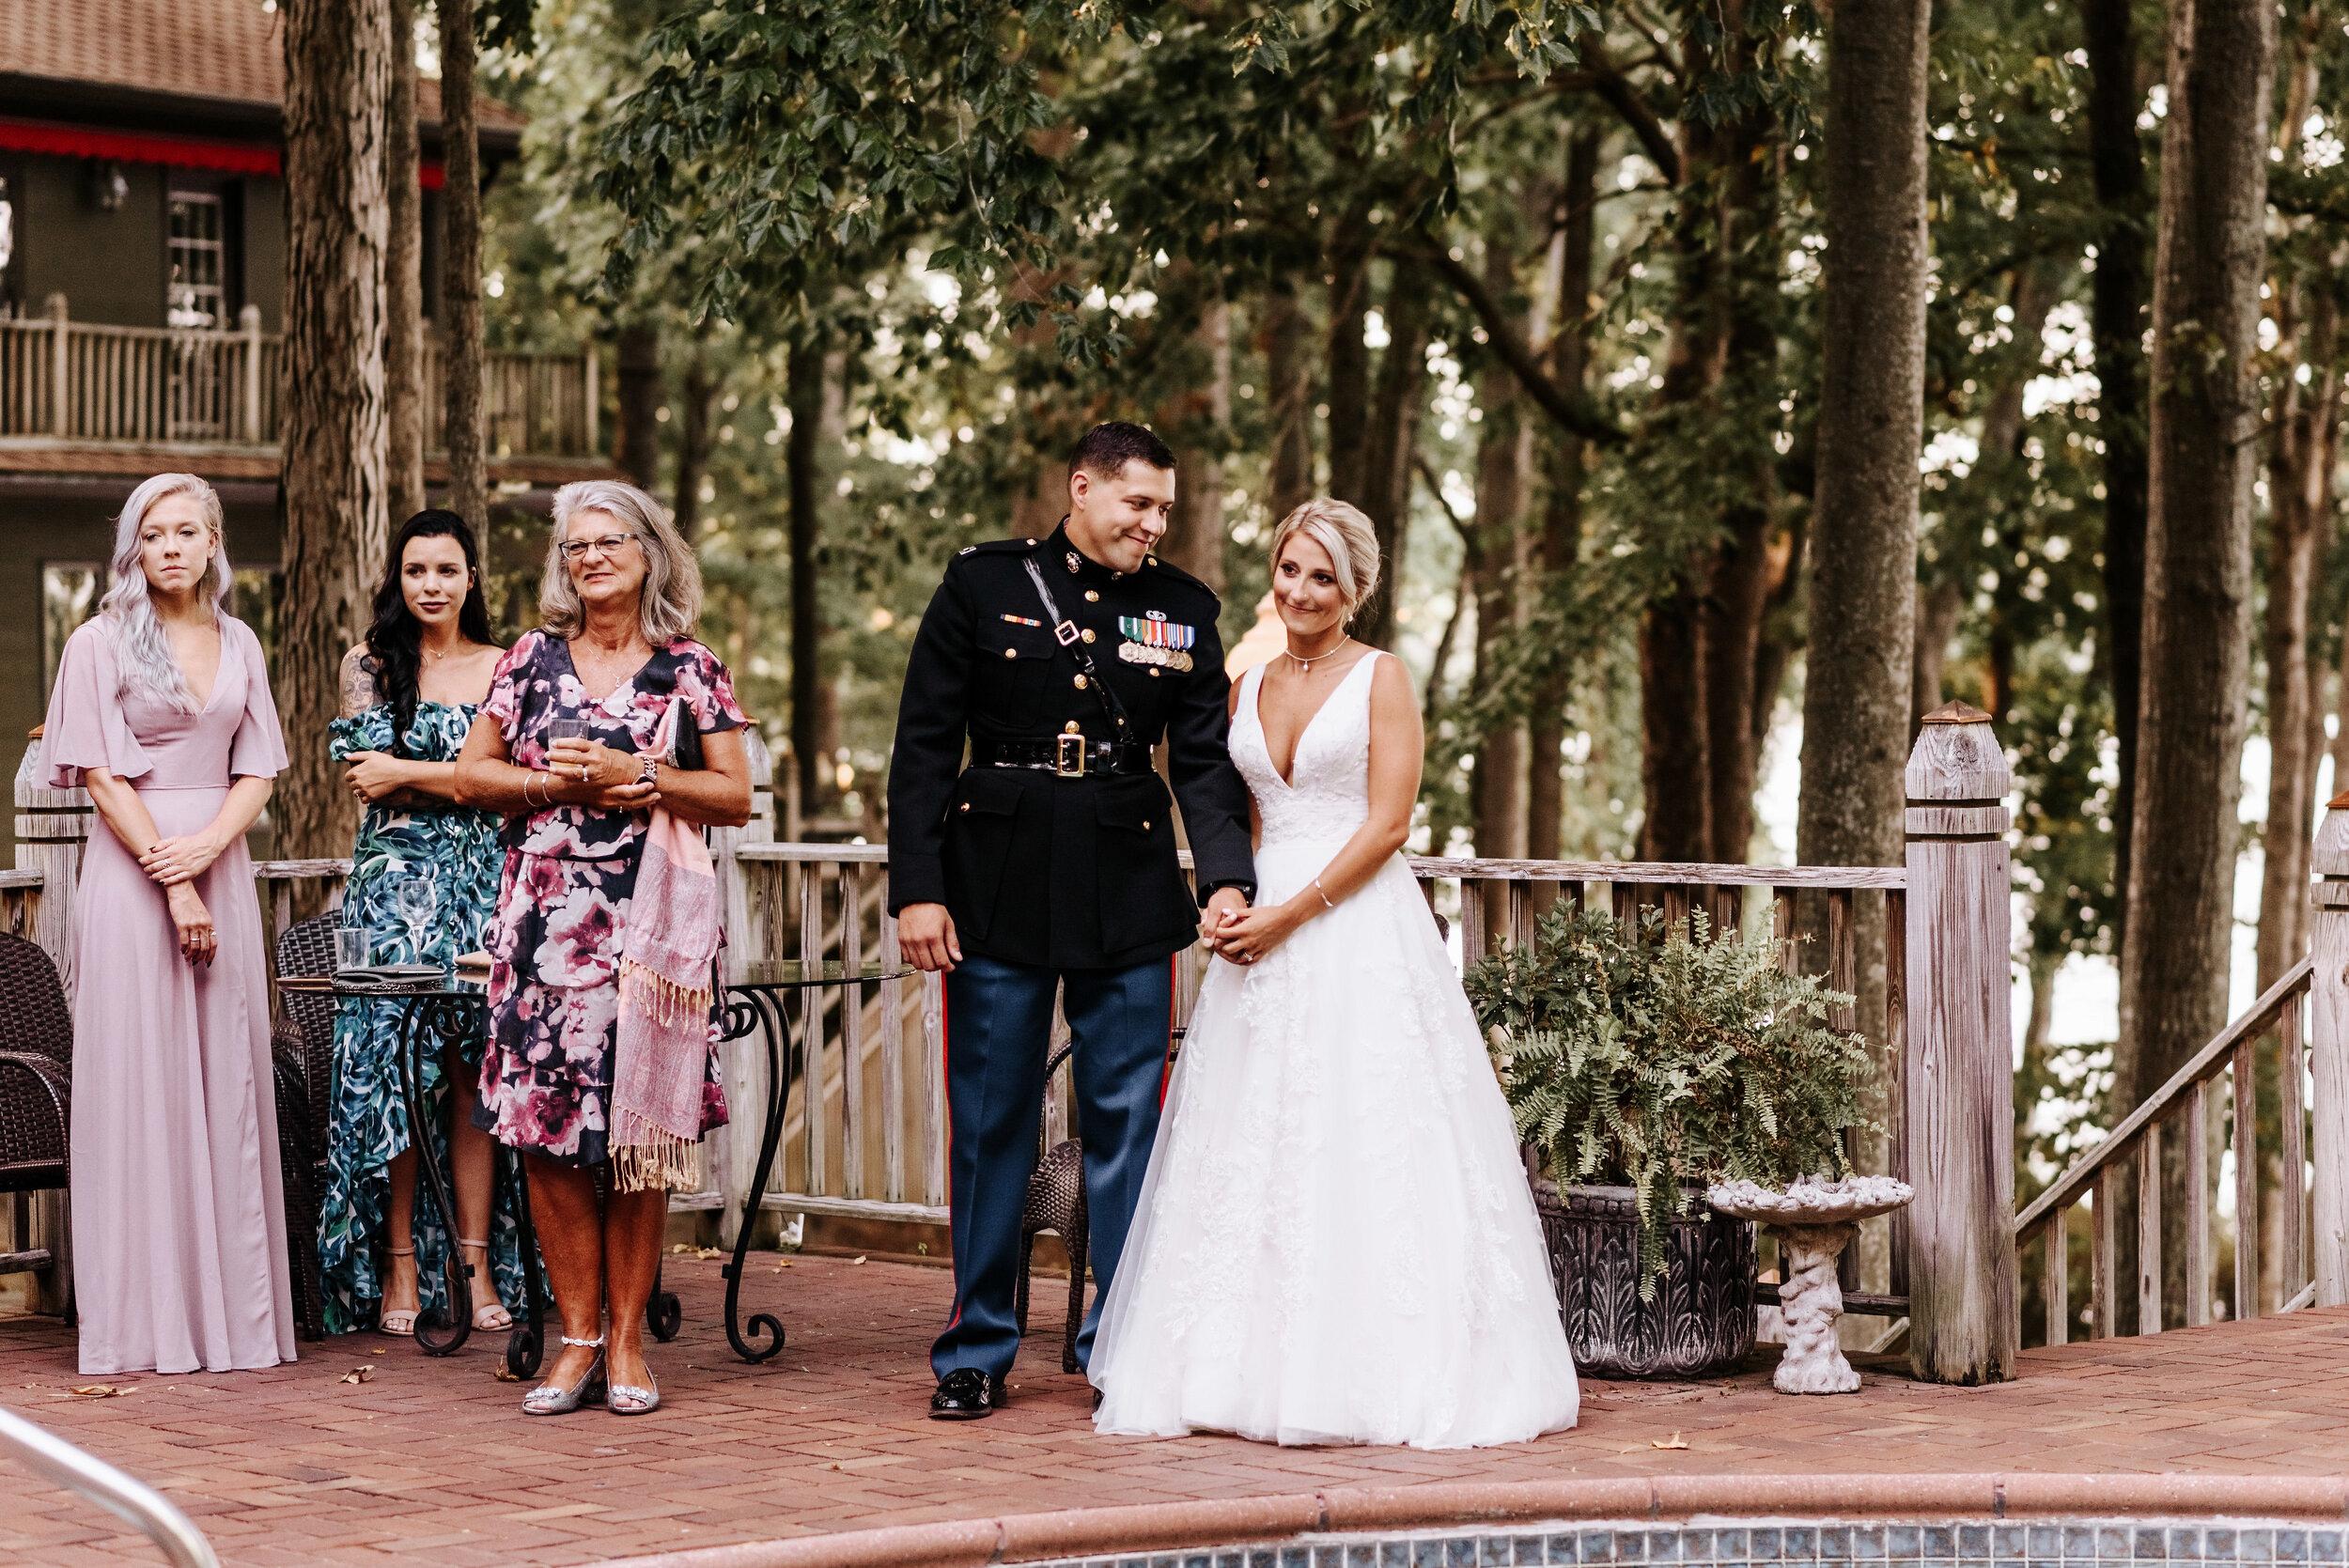 Emily_Mike_Wedding_Celebrations_at_the_Reservoir_Pool_Pavilion_Richmond_Virginia_Wedding_Photographer_Photography_by_V_78.jpg